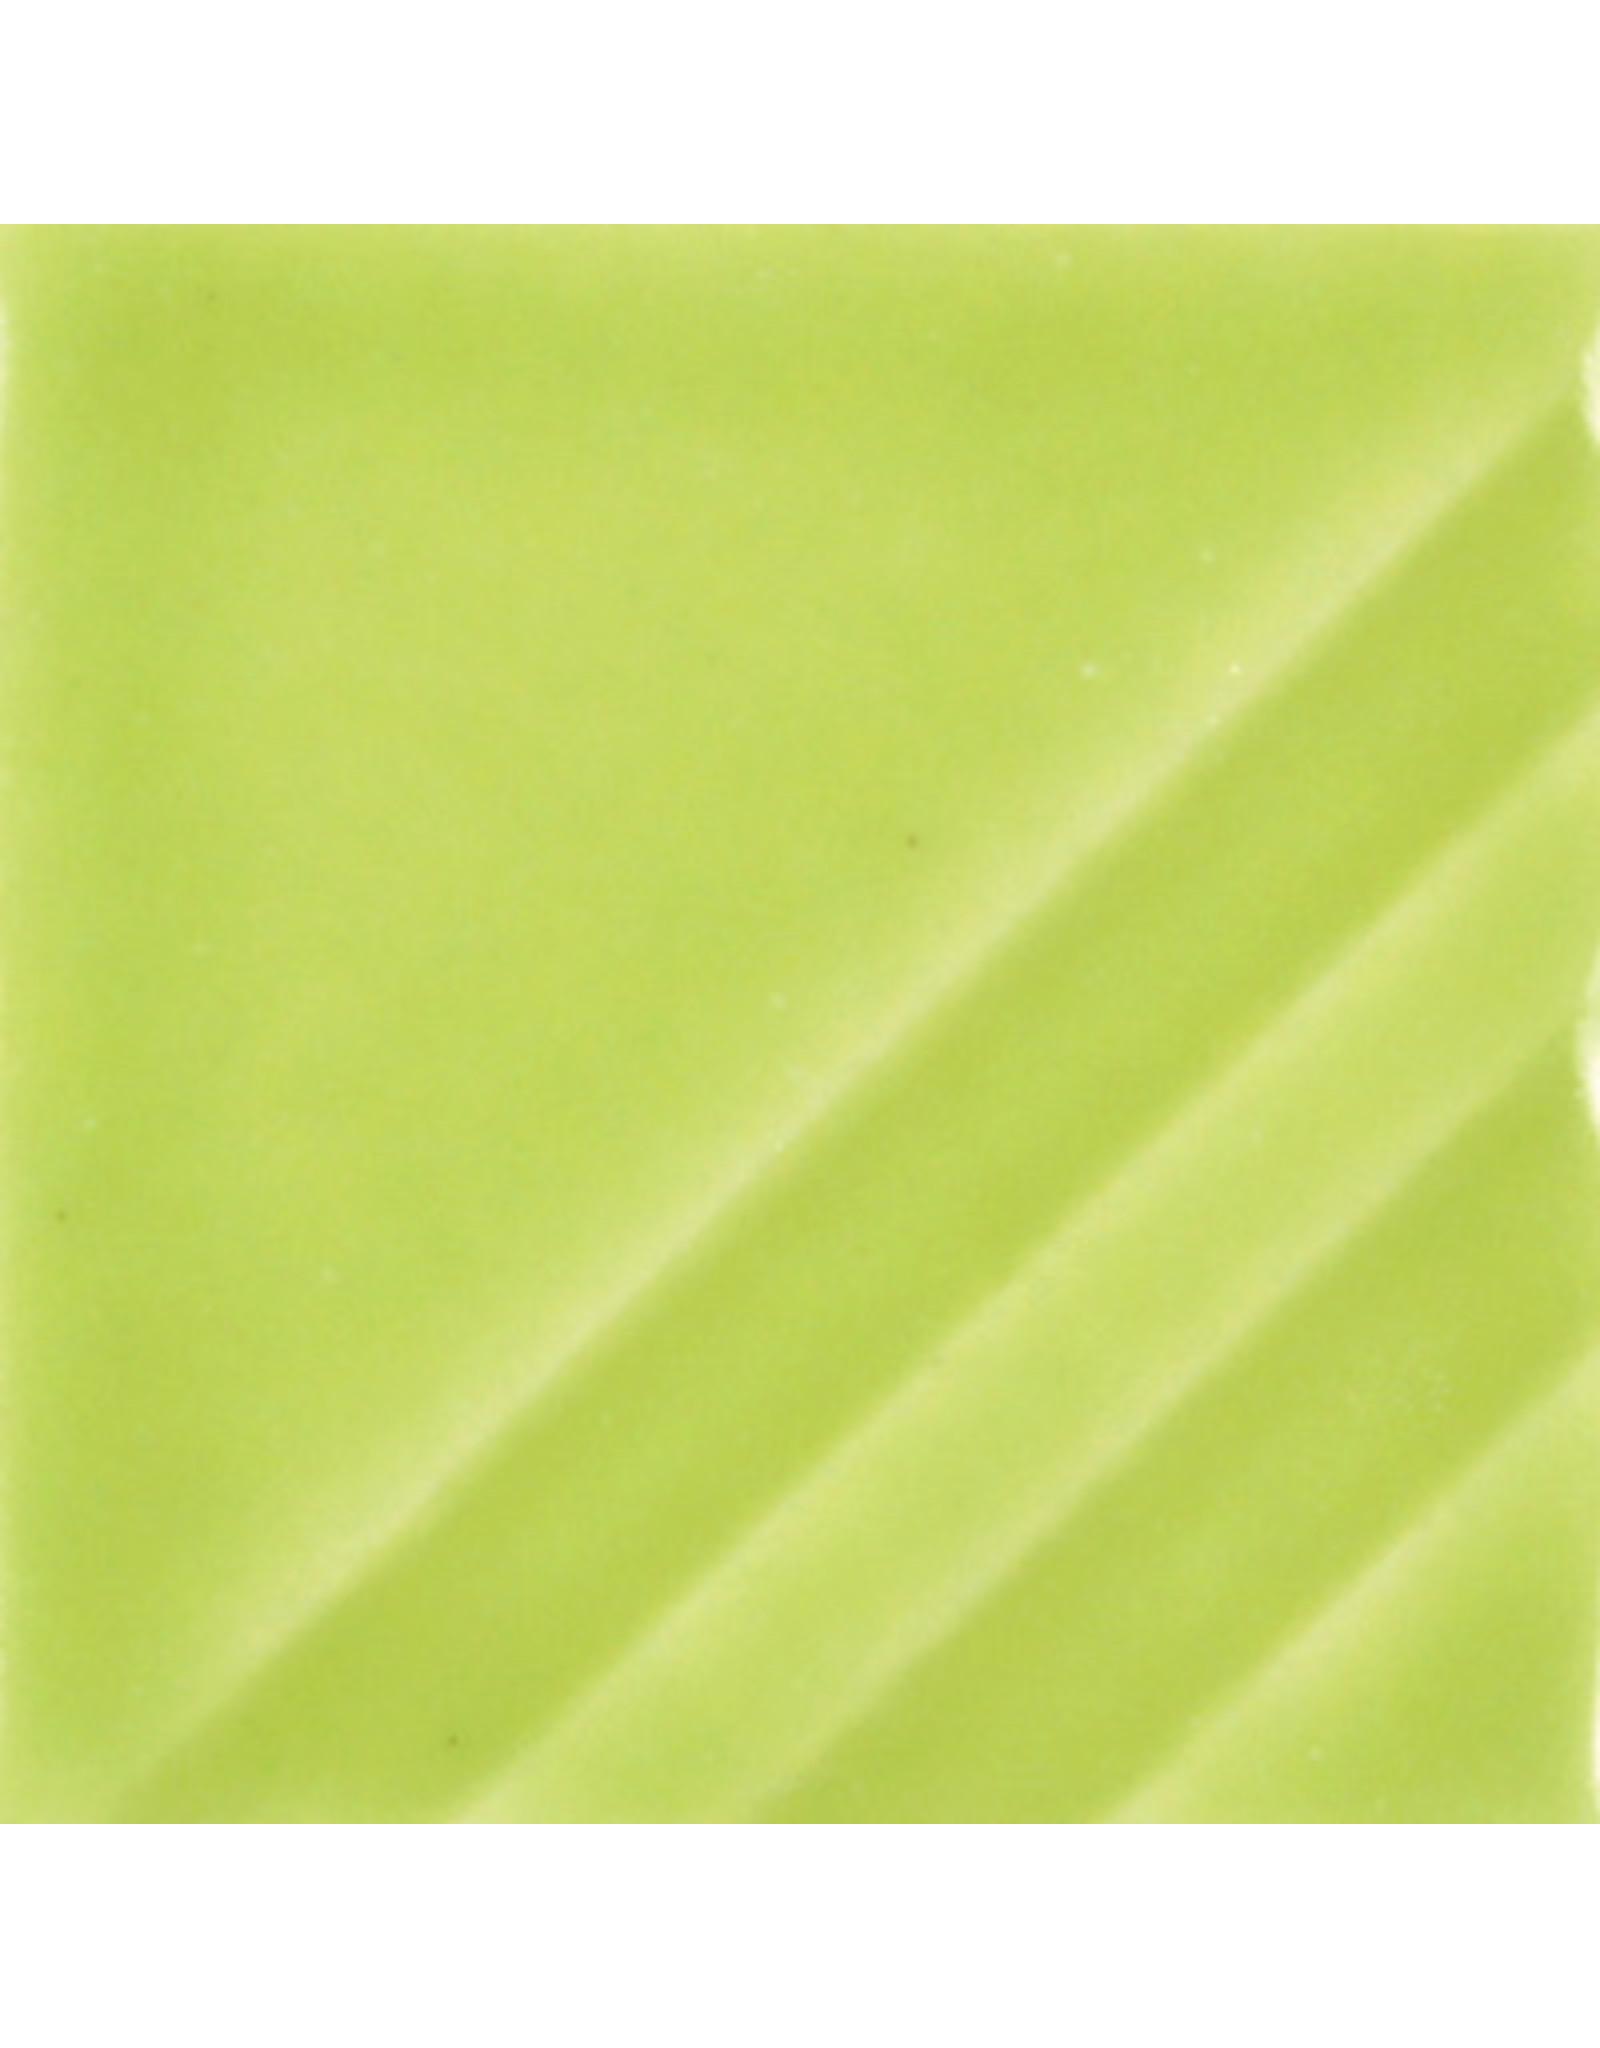 Mayco Mayco Foundations Key Lime 118ml